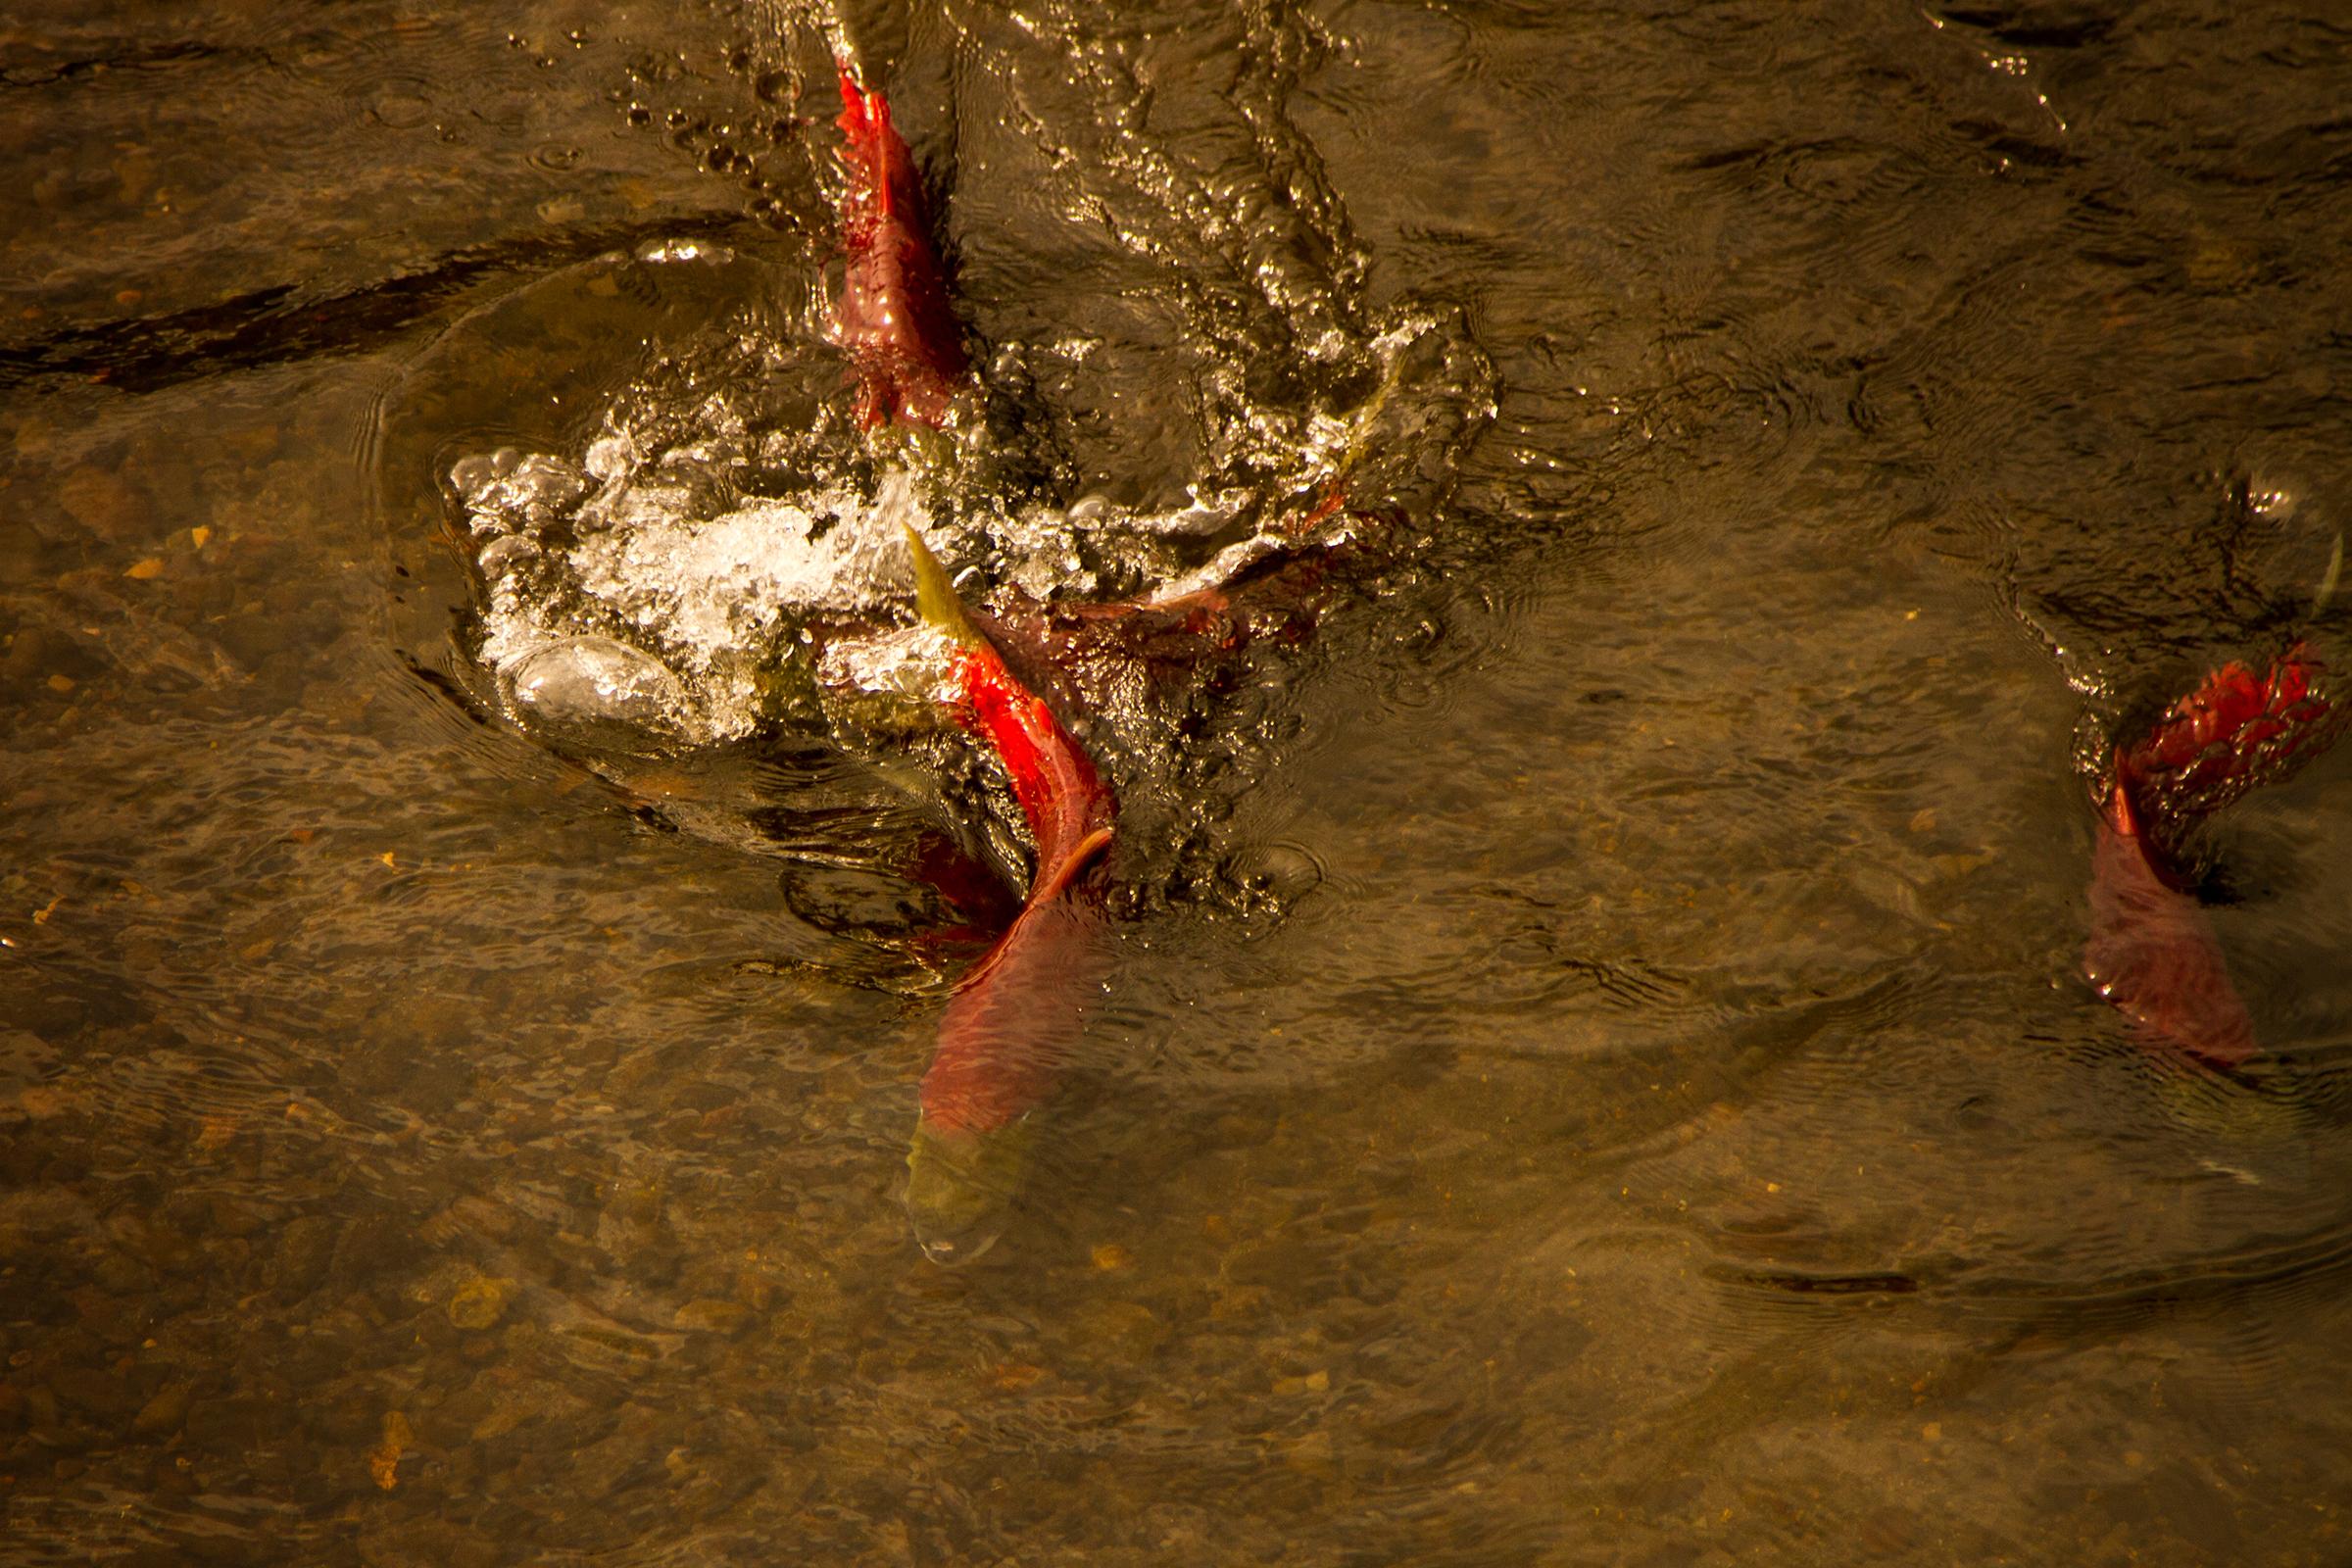 Spawning sockeye make their way up increasingly shallow tributaries of British Columbia's Skeena River. Photograph by Dan Mesec